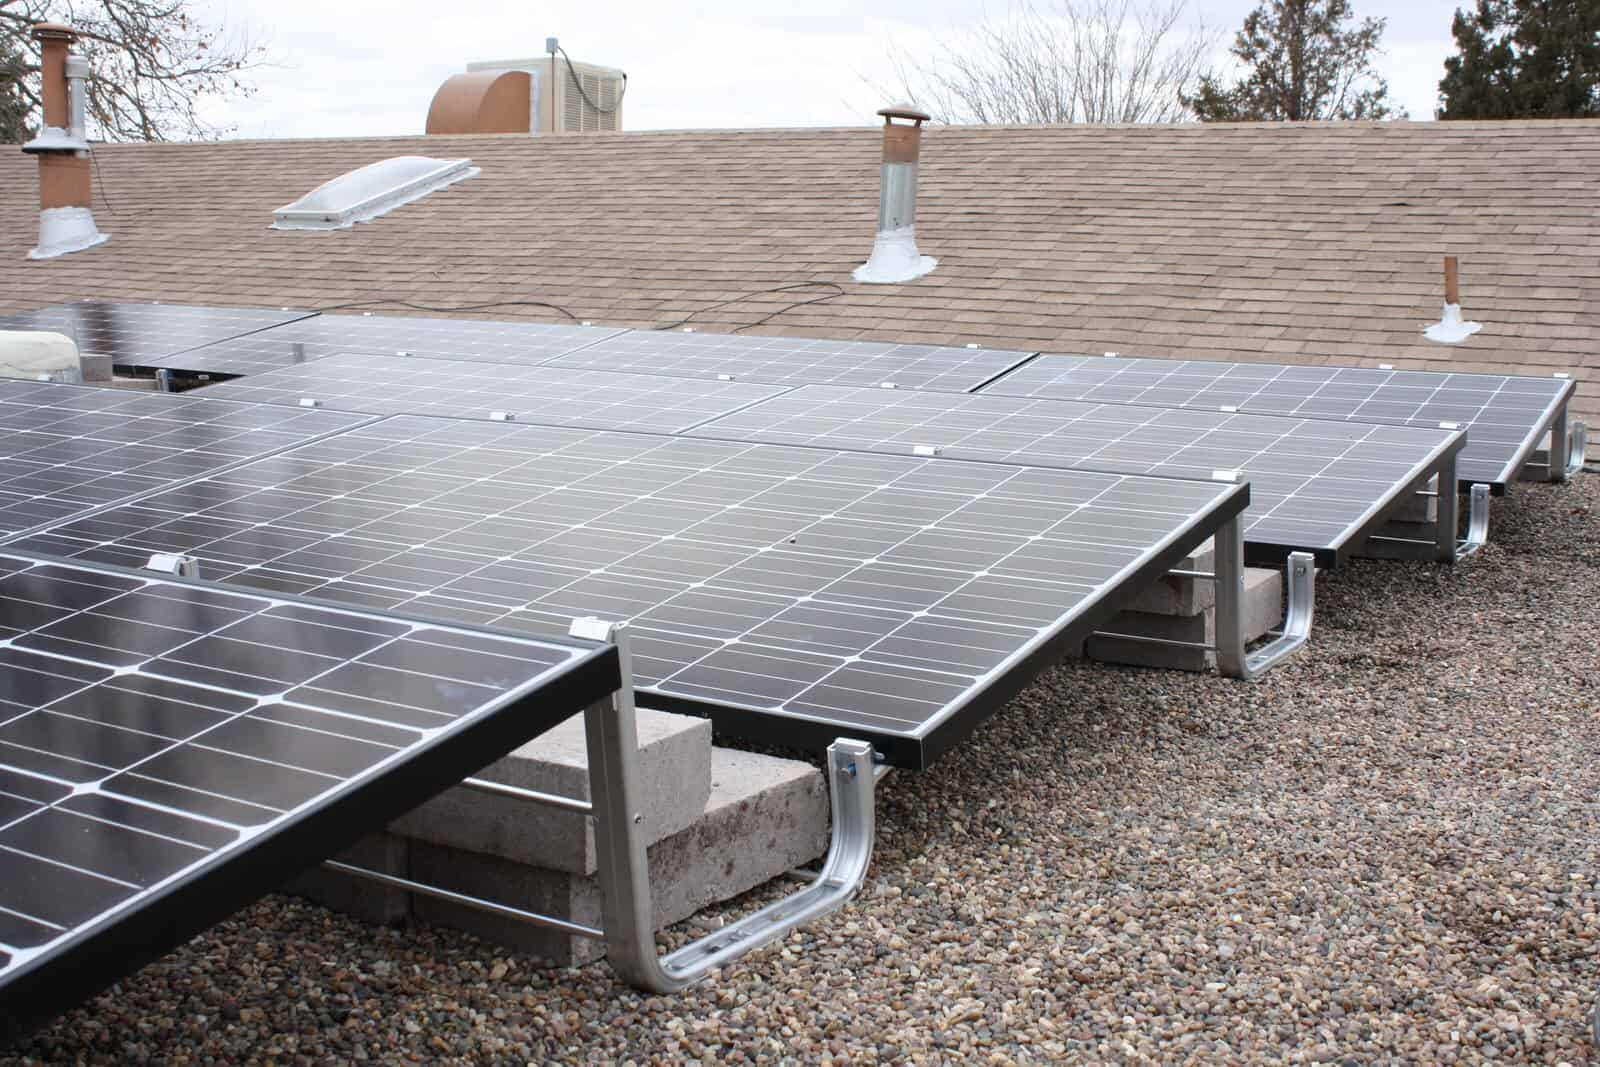 solar panel on roof image